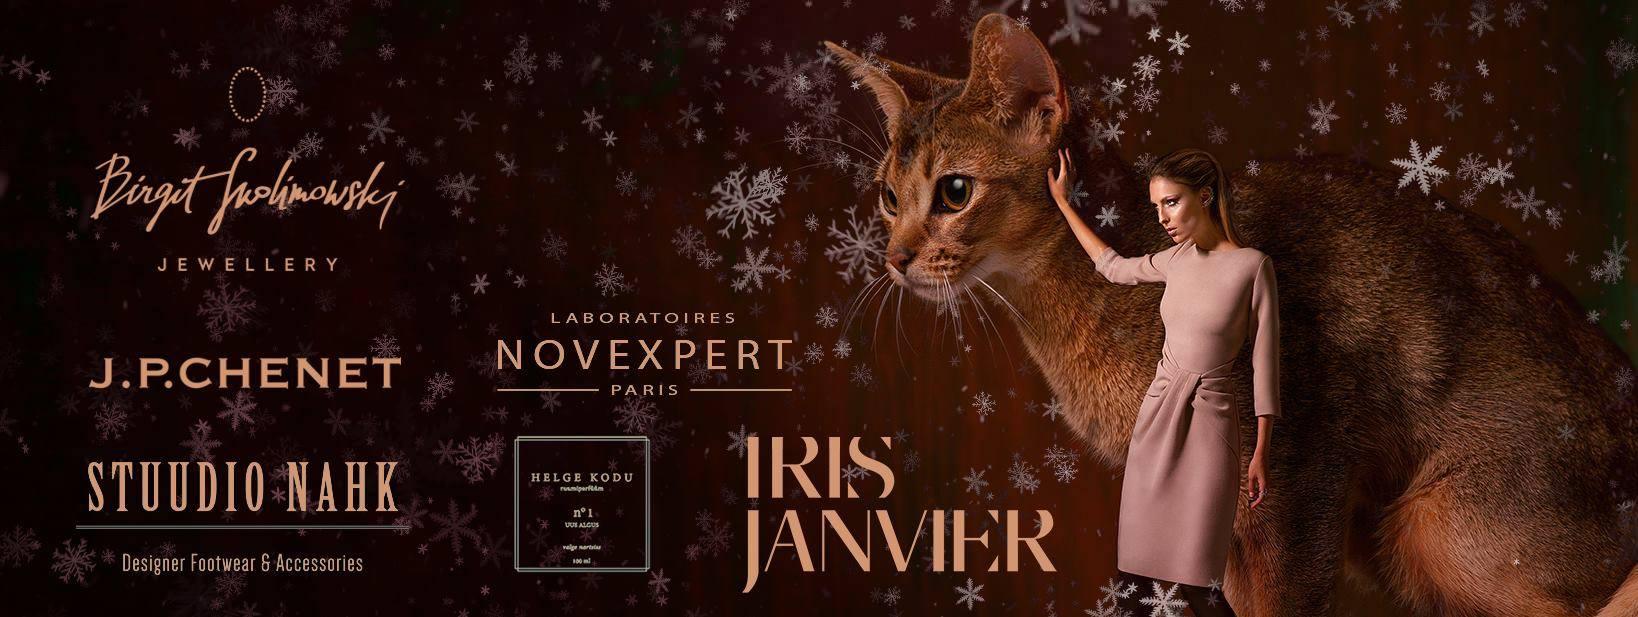 iris janvier